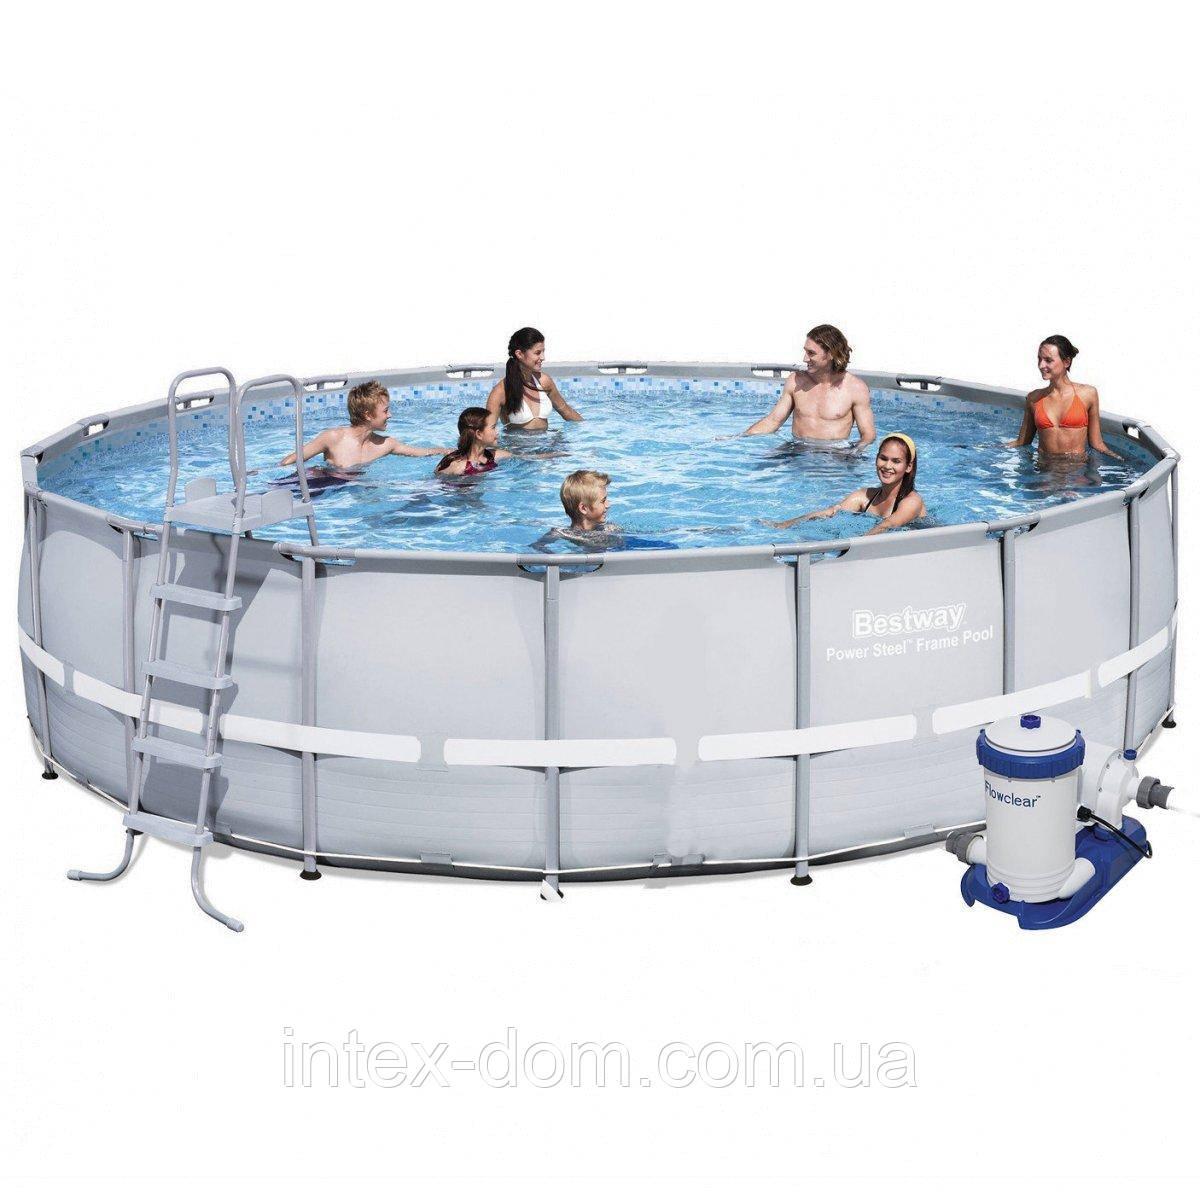 Каркасный бассейн Bestway 56705, 671 х 132 см (9 463 л/ч, лестница, подстилка, тент)